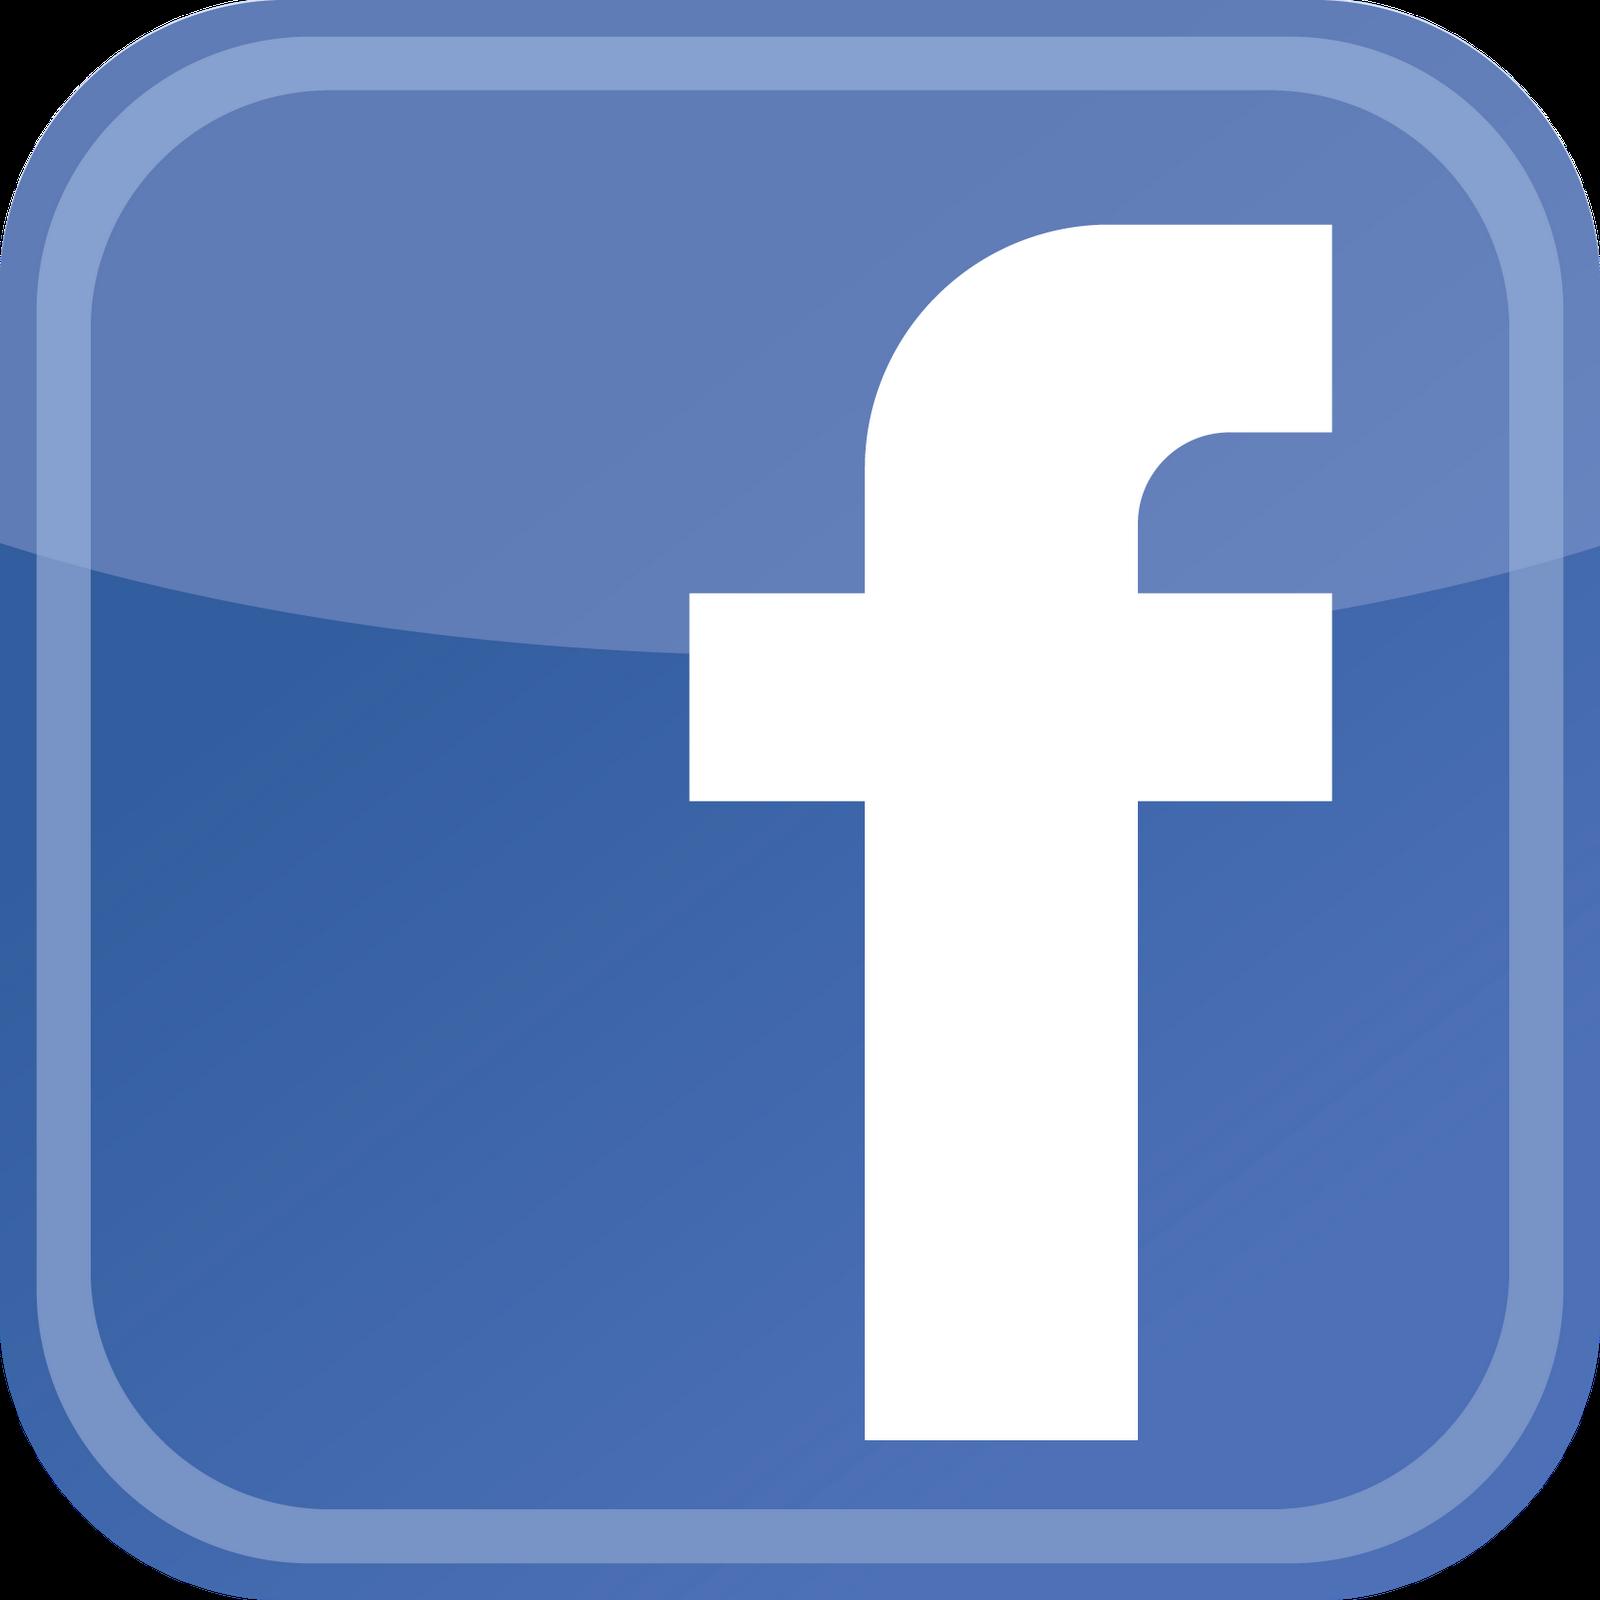 https://www.facebook.com/nerdnation3264